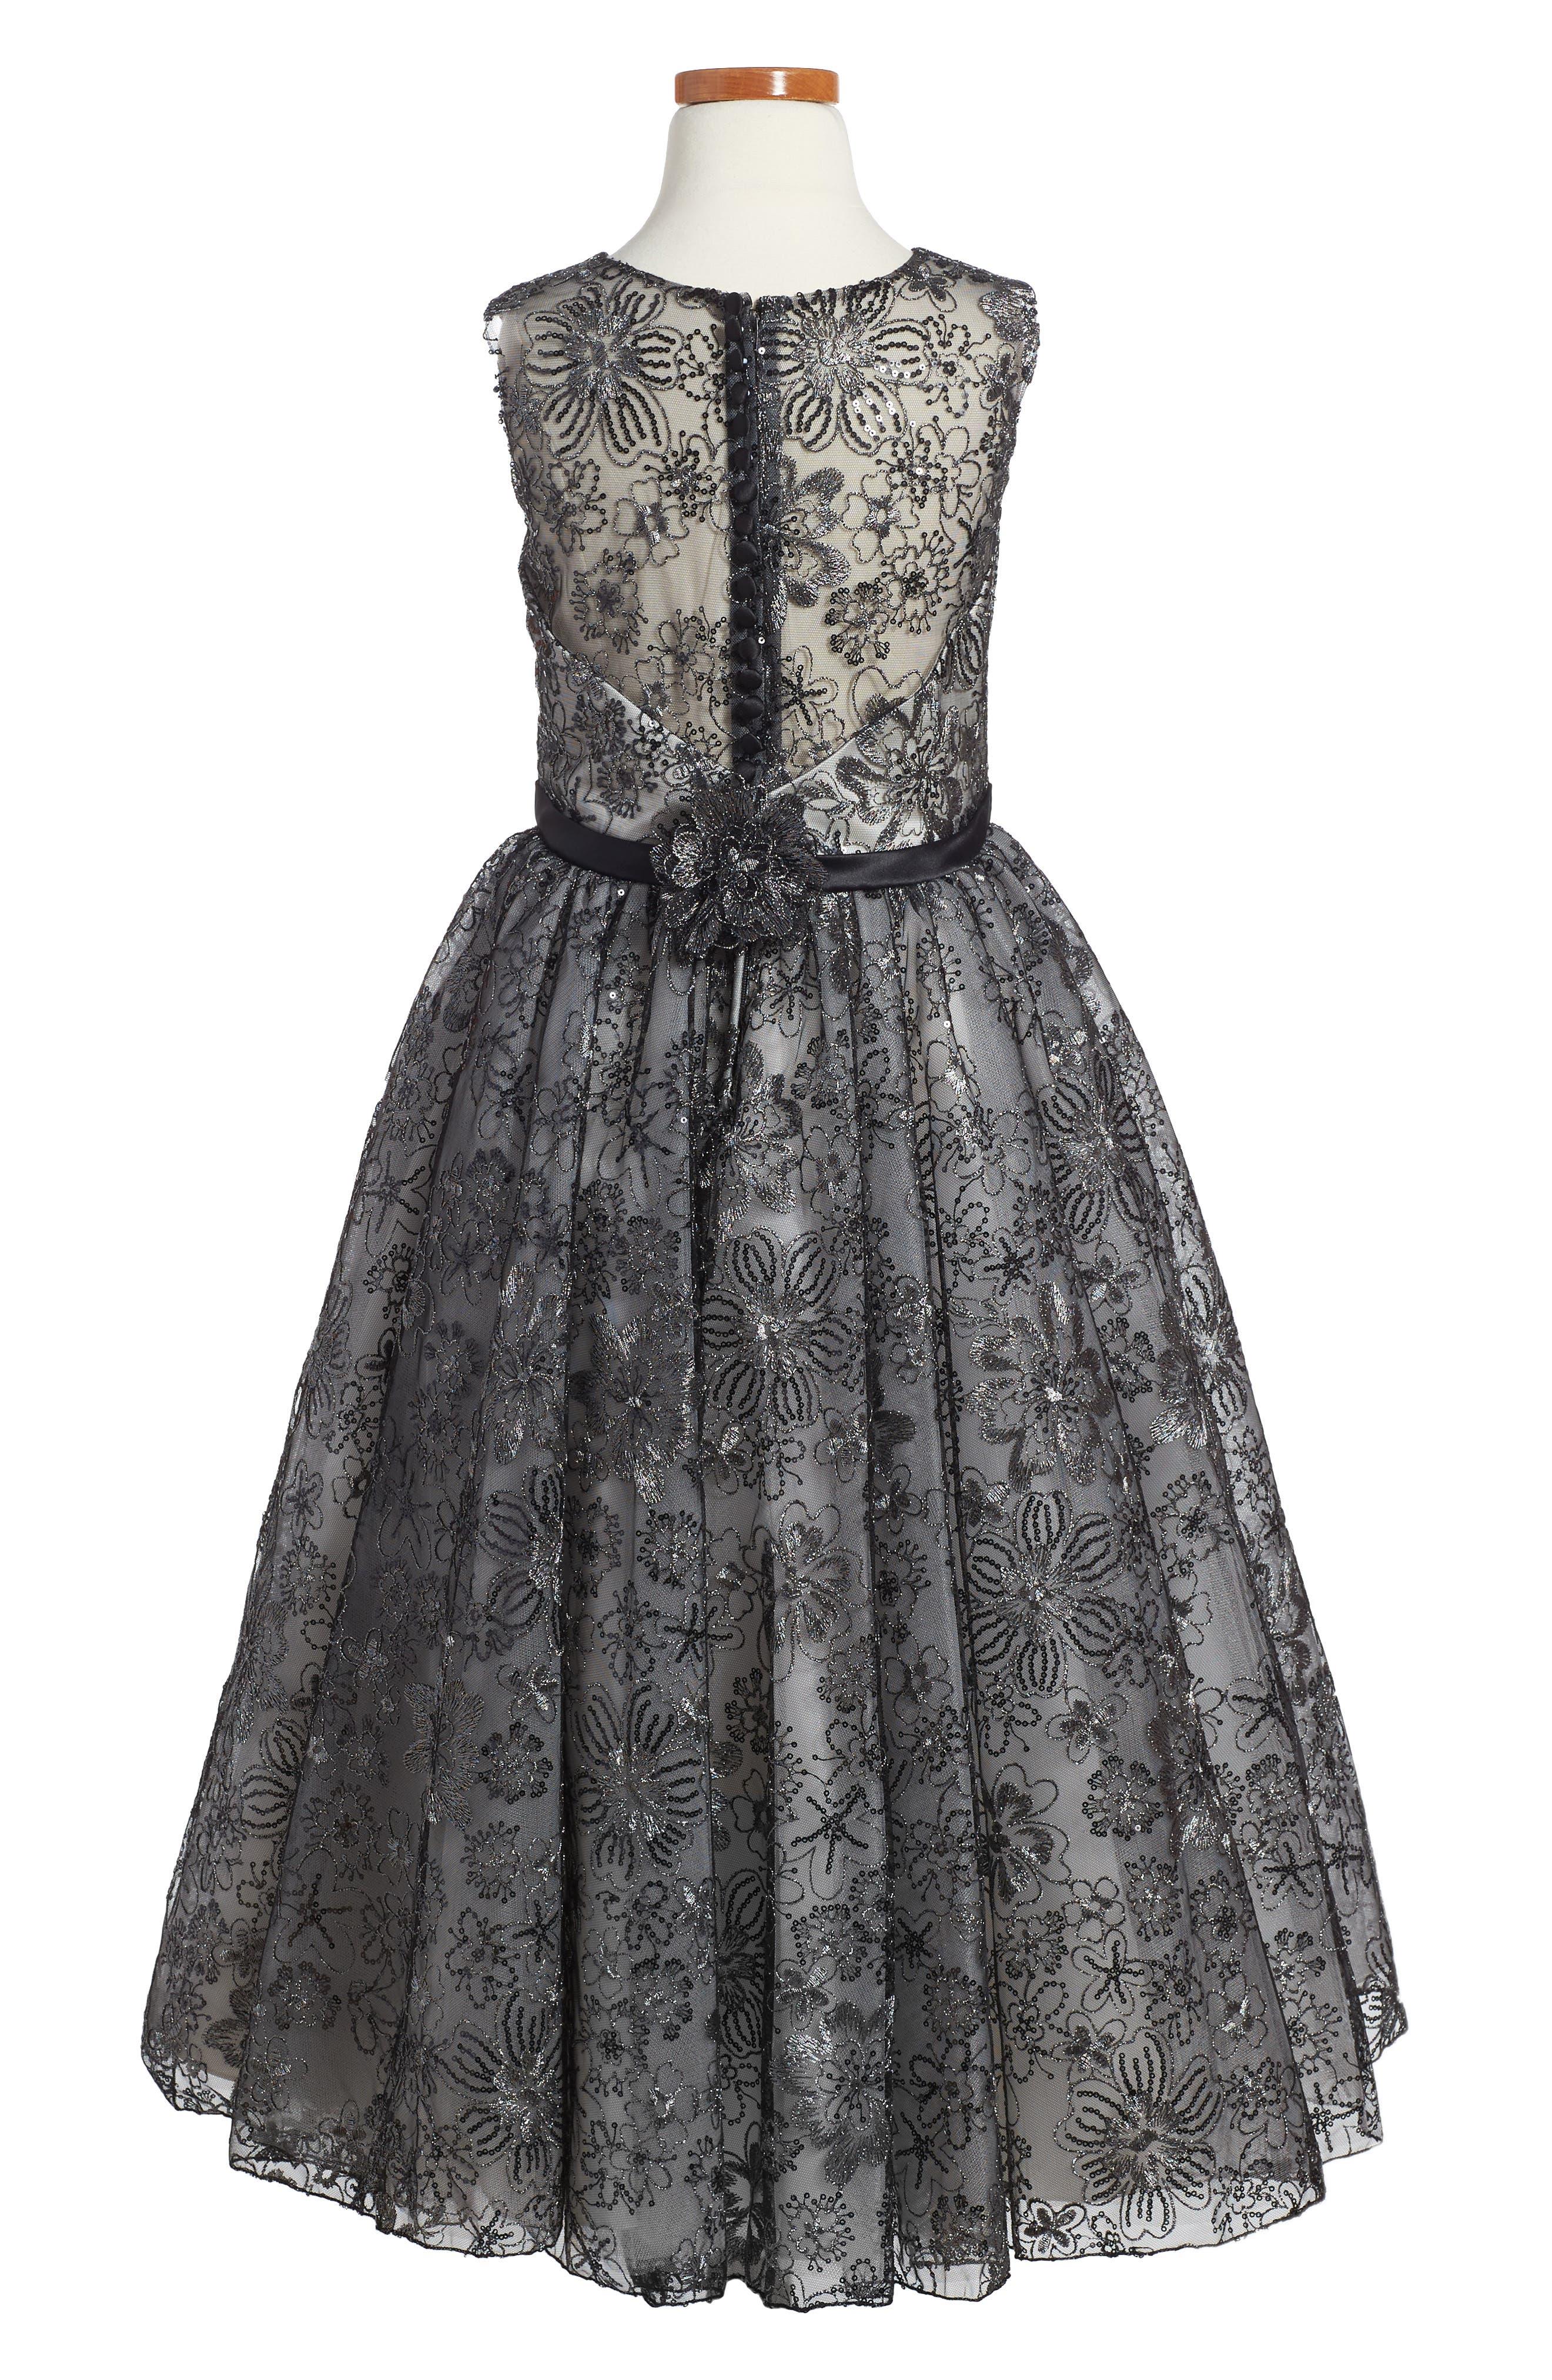 Sequin & Lace Dress,                             Alternate thumbnail 2, color,                             Black/ Ivory